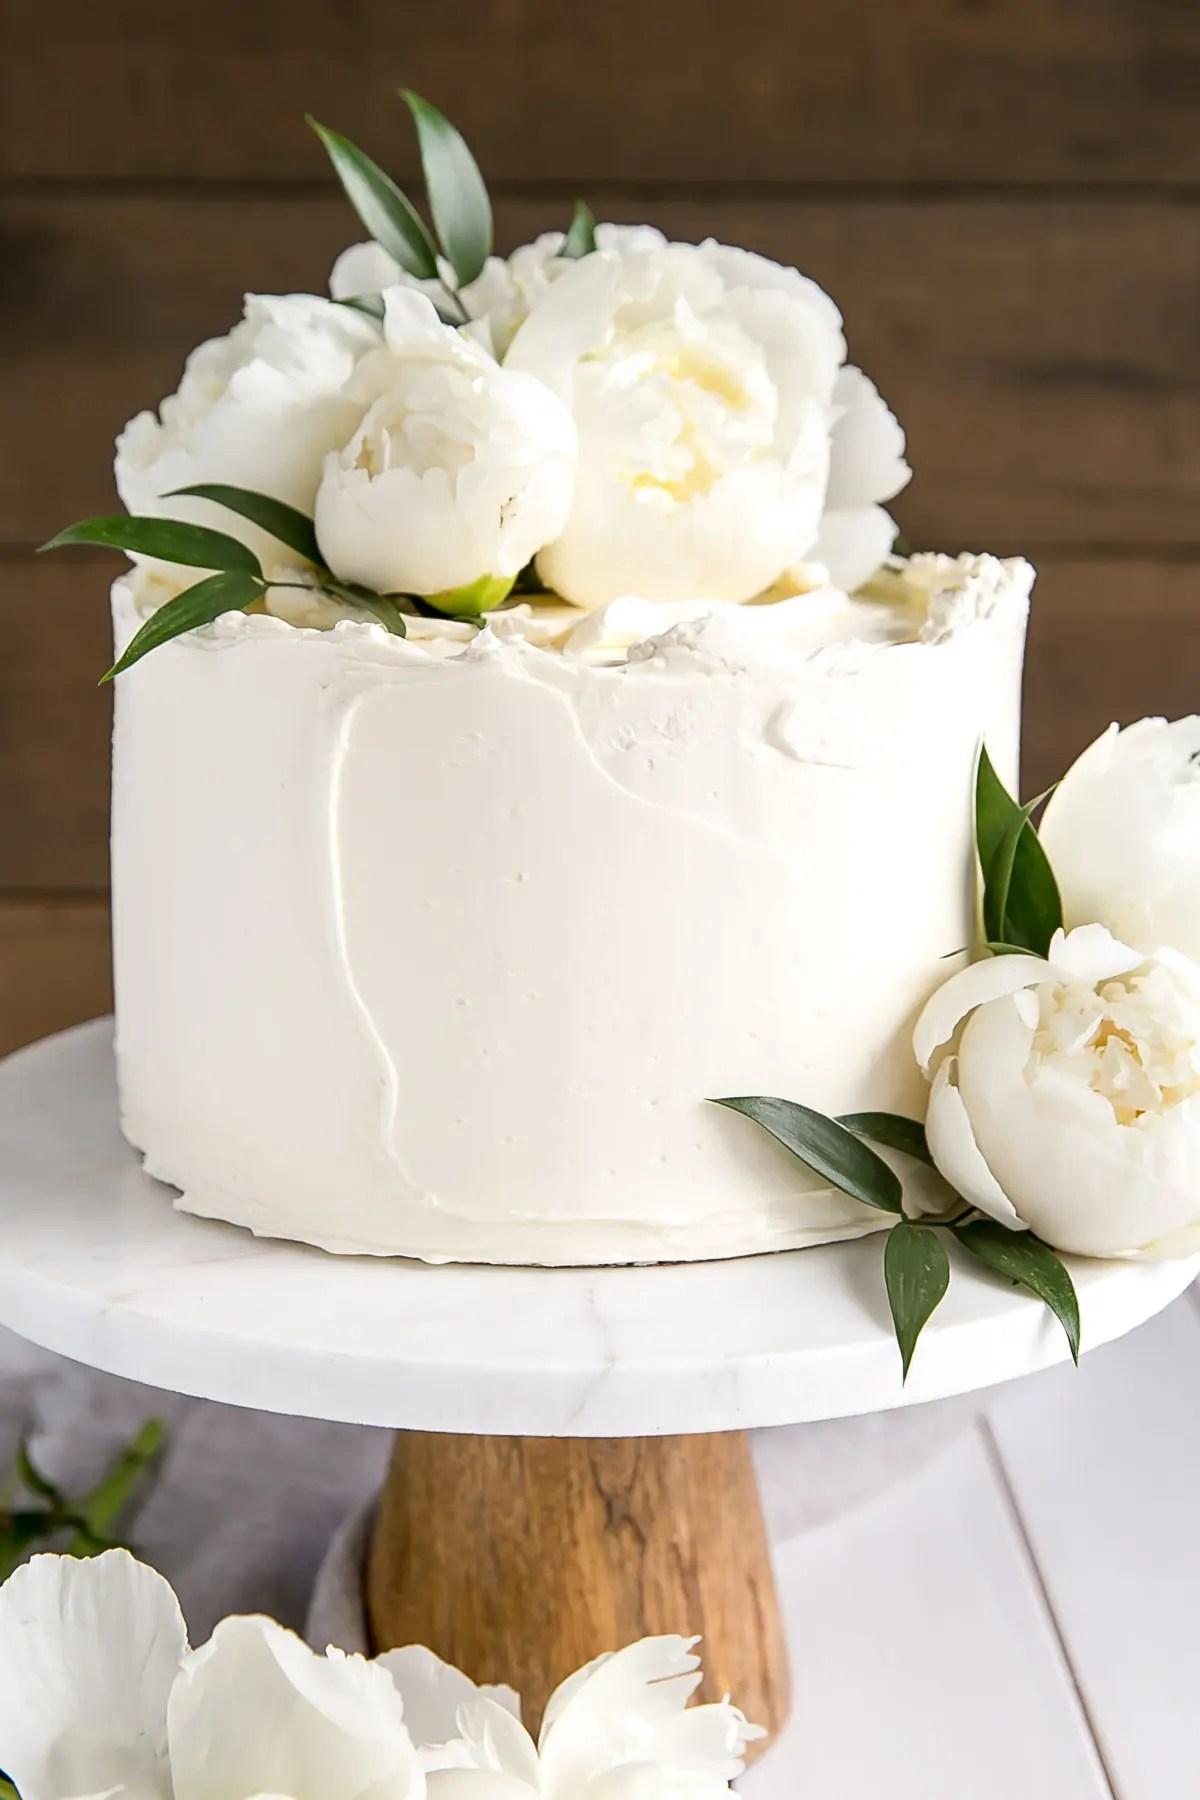 Fullsize Of Royal Wedding Cake